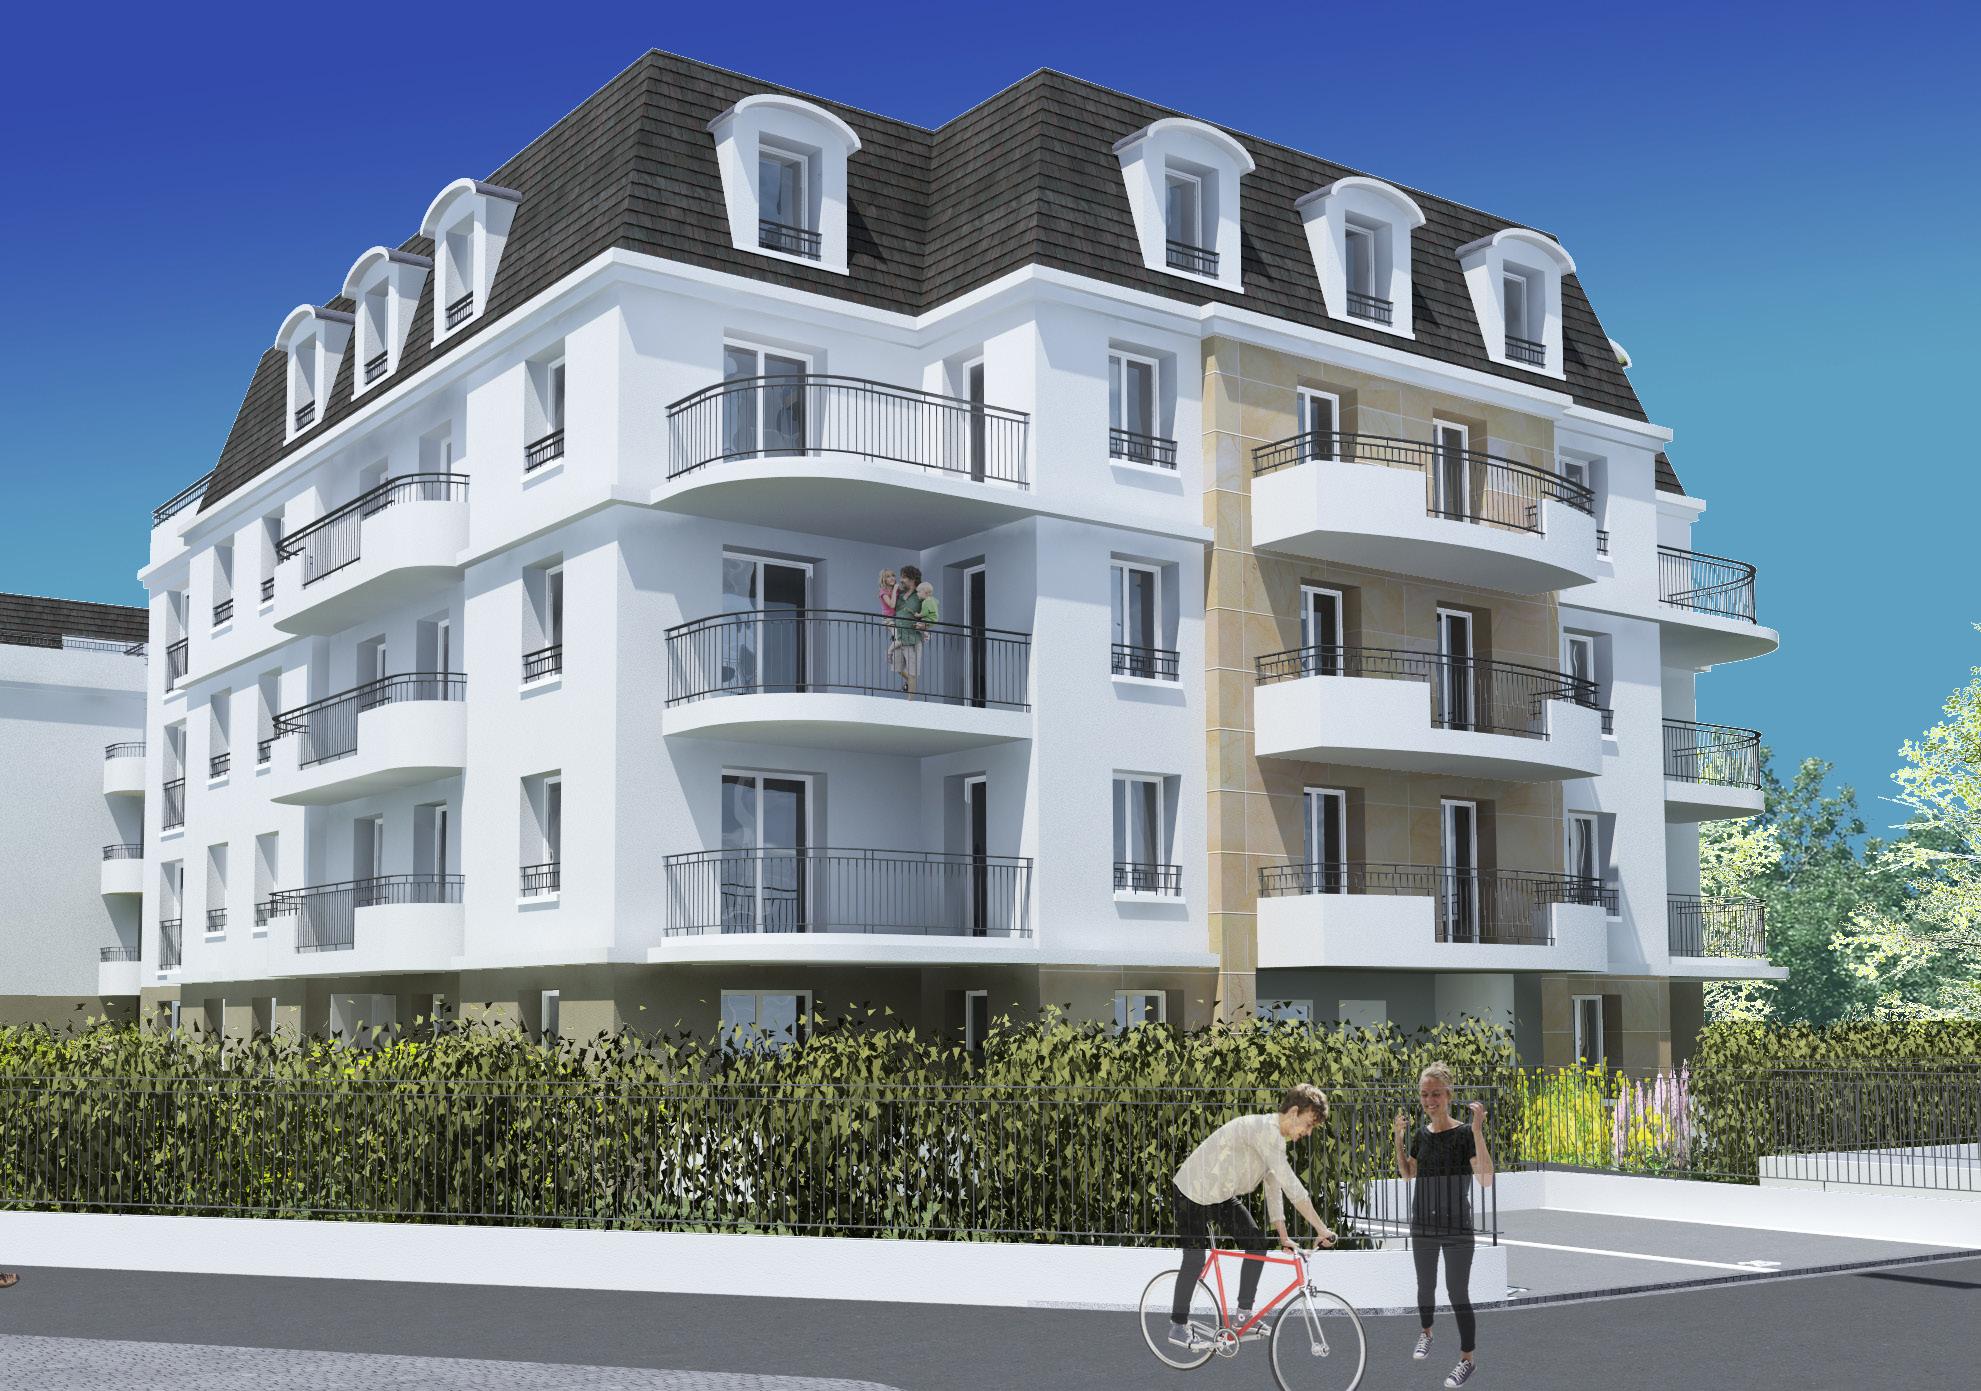 Agence immobili re balant thionville for Architecte thionville